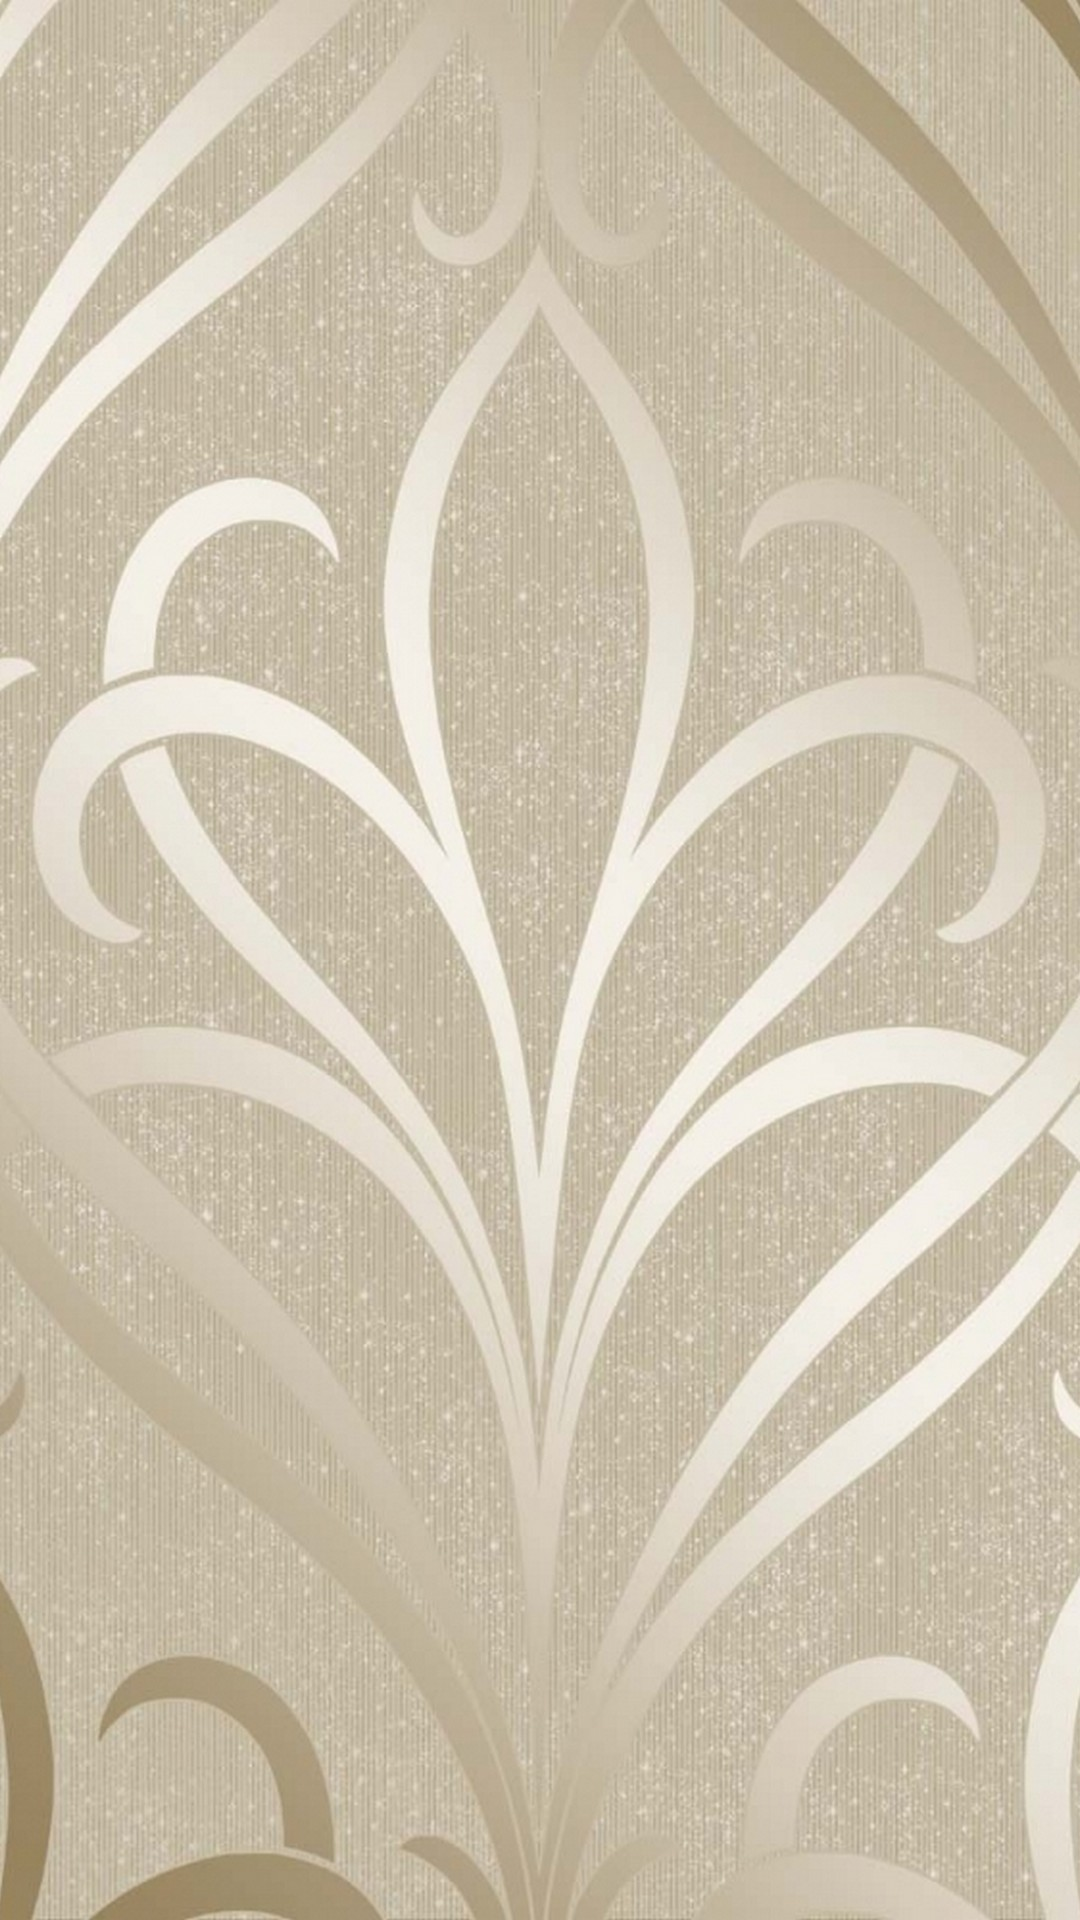 Metallic Gold Wallpaper Iphone Resolution - Cream Metallic Wallpaper Uk - HD Wallpaper